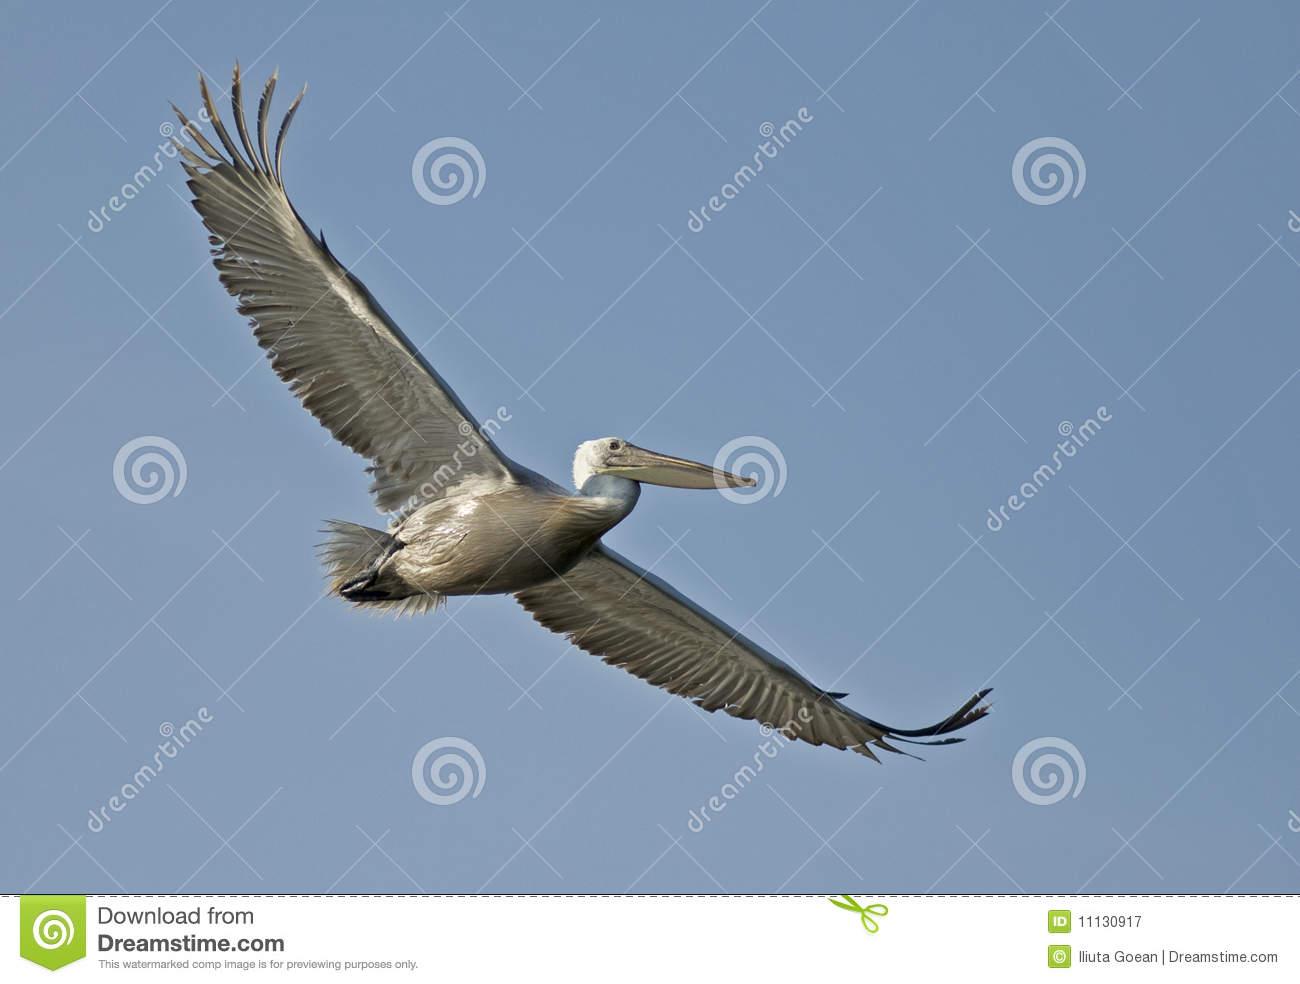 Crispy Or Dalmatian Pelican In Flight Royalty Free Stock.